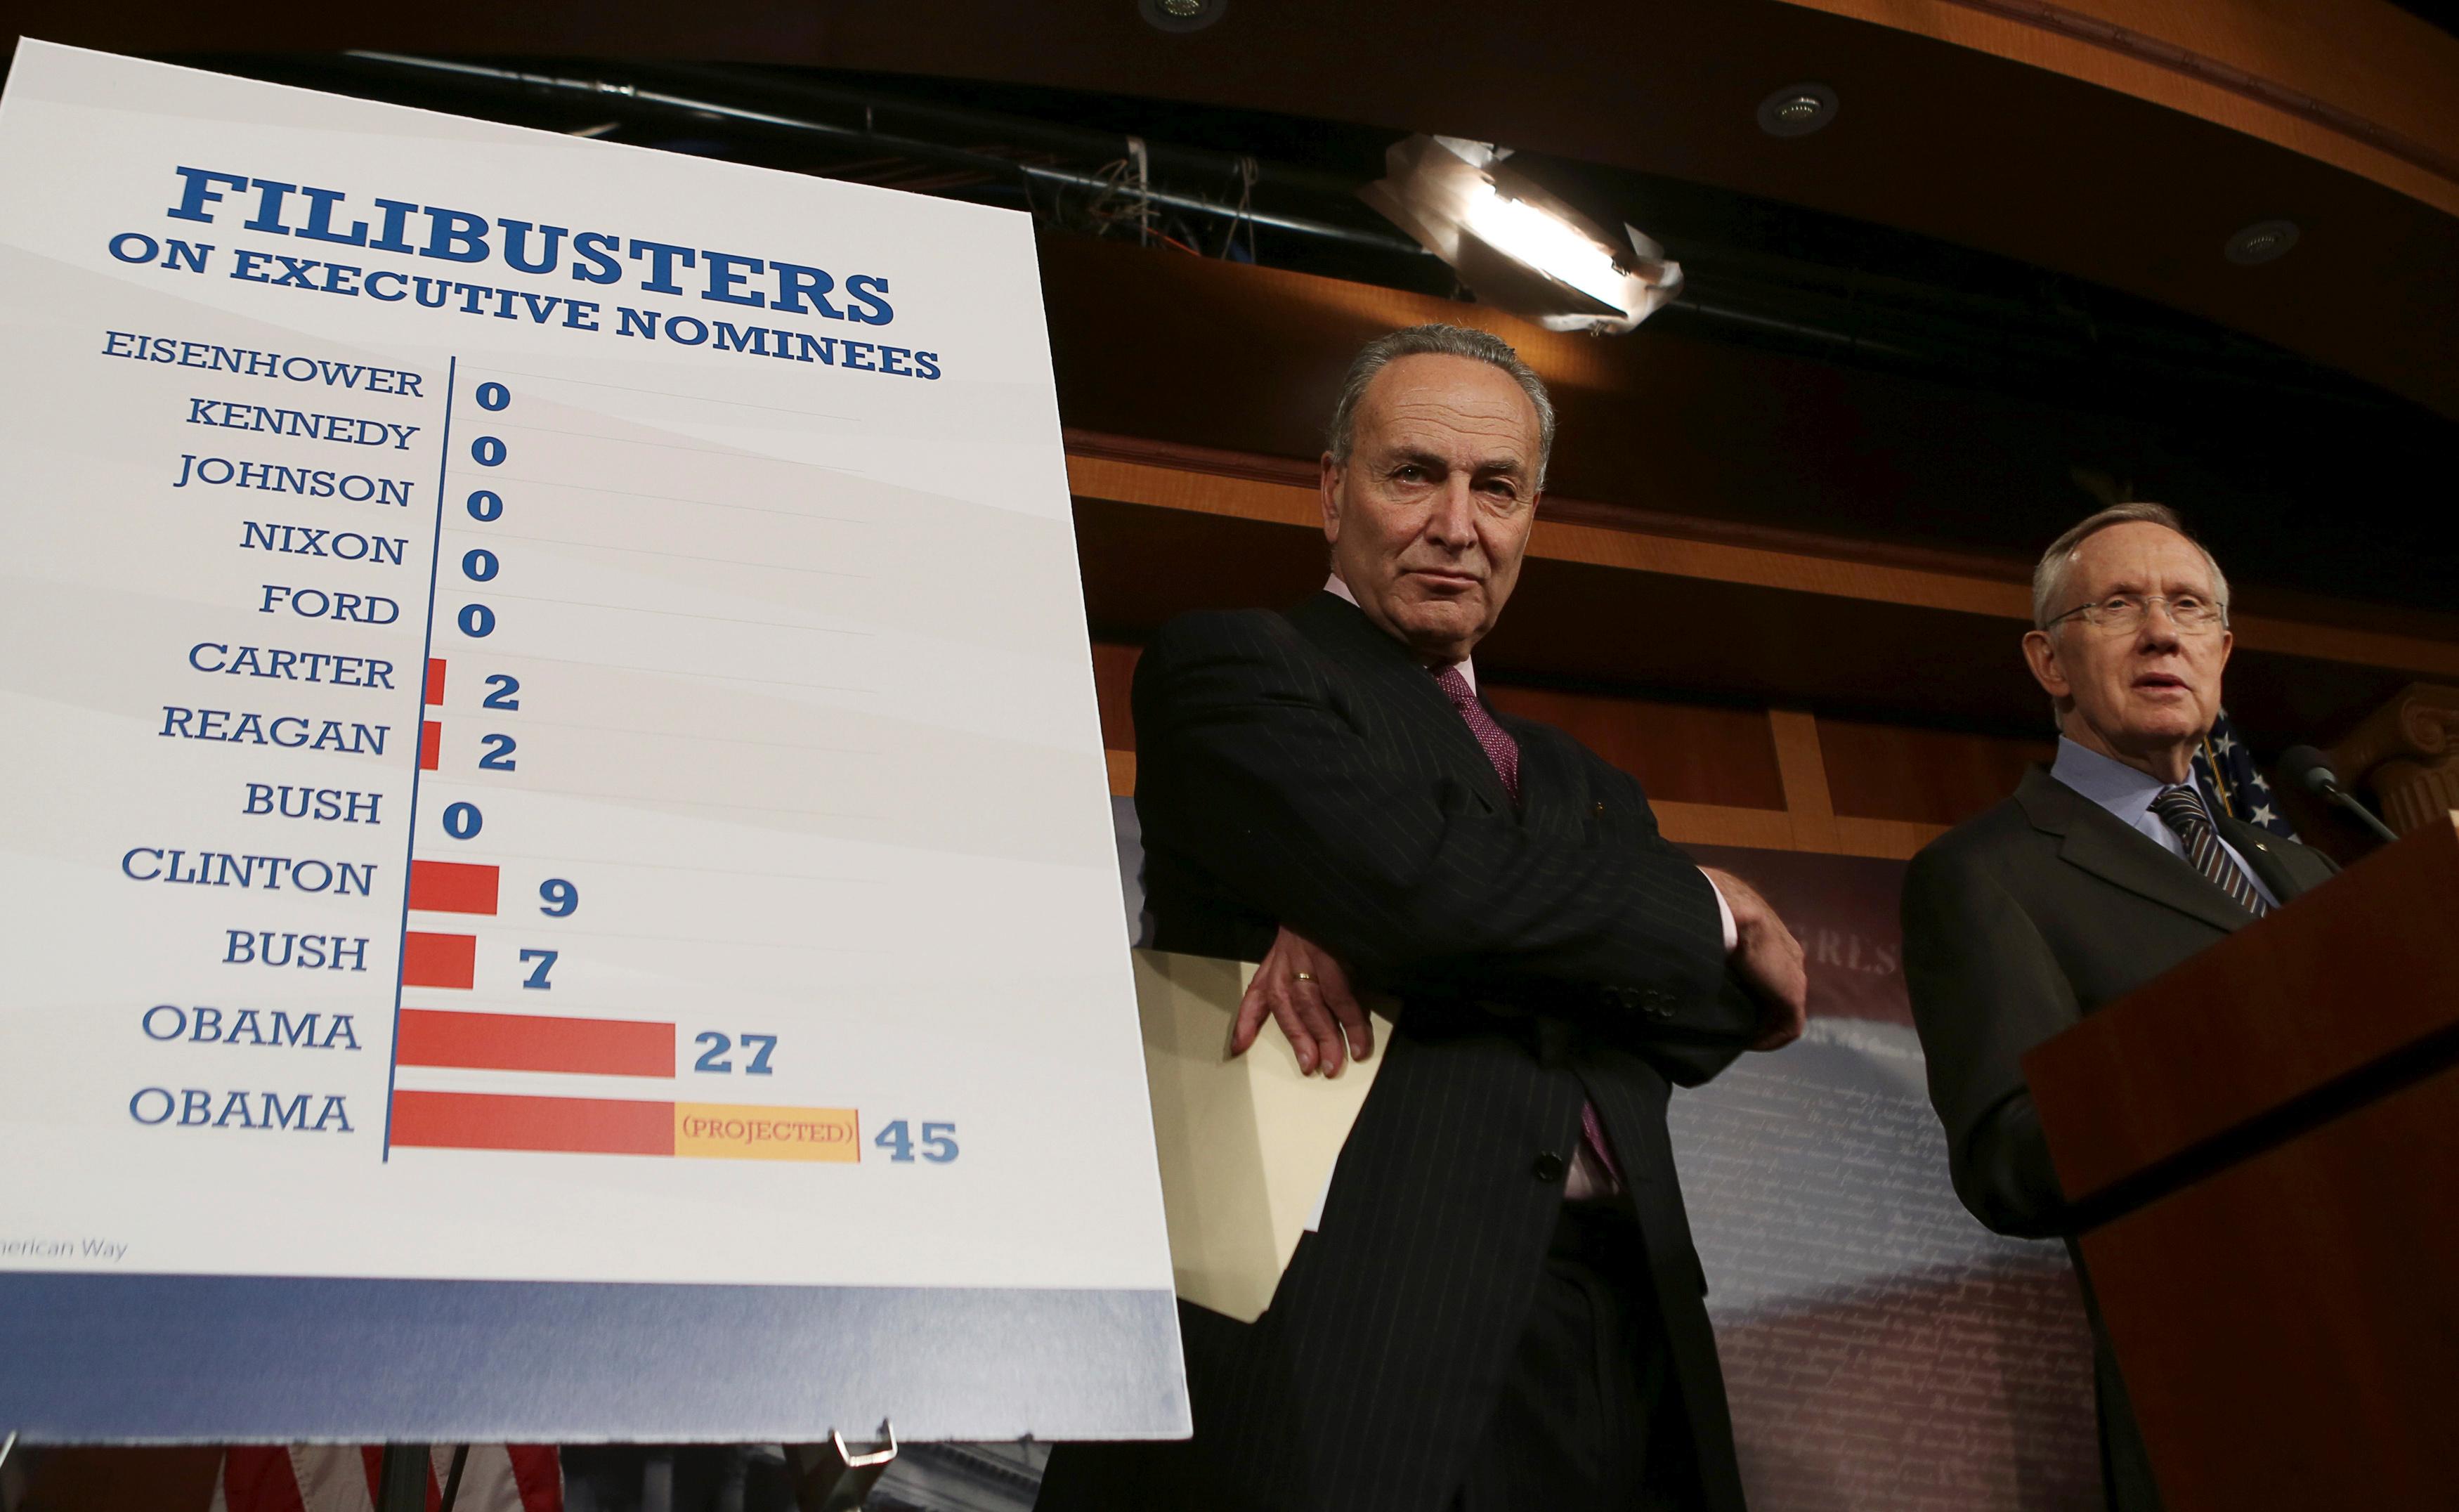 Senate Majority Leader Harry Reid (D-NV) (R) and Senator Charles Schumer (D-NY) (L) hold a press conference on Capitol Hill in Washington November 21, 2013.   REUTERS/Gary Cameron